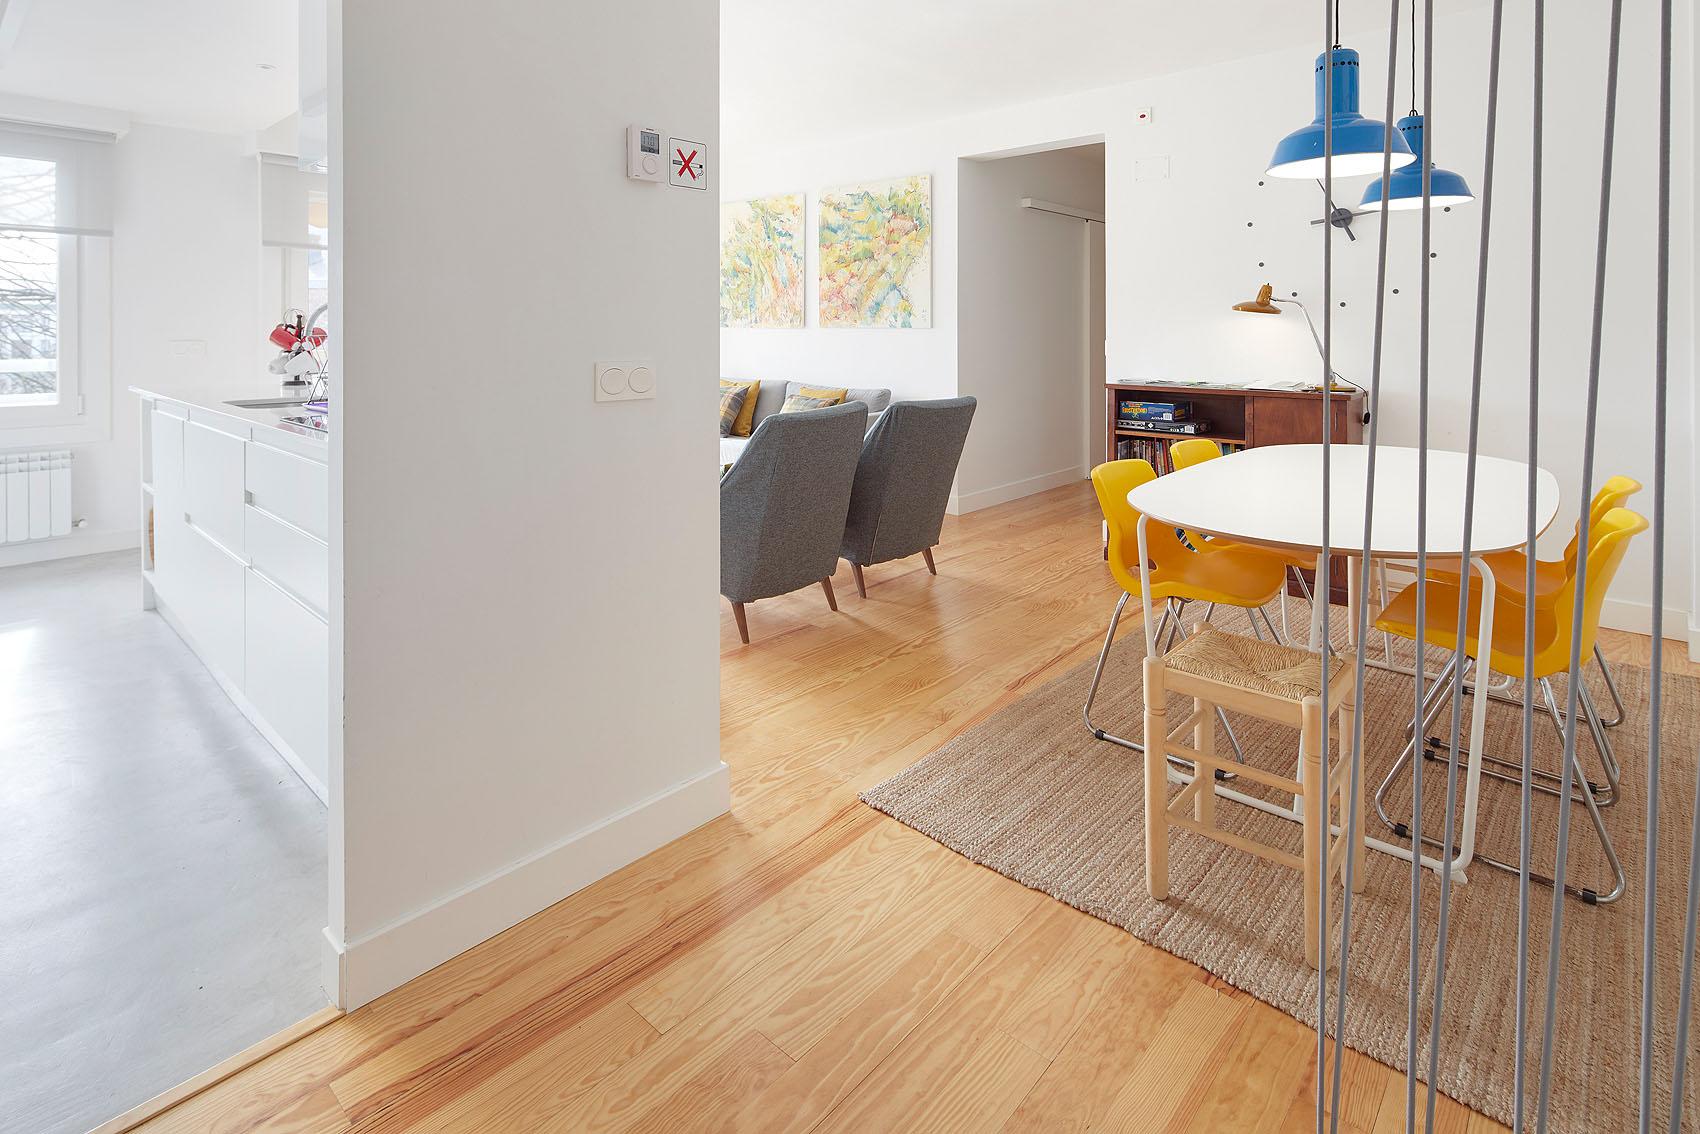 Apartamento Pilartxo-Enea, Aterian - Iñaki Caperochipi - Fotografía